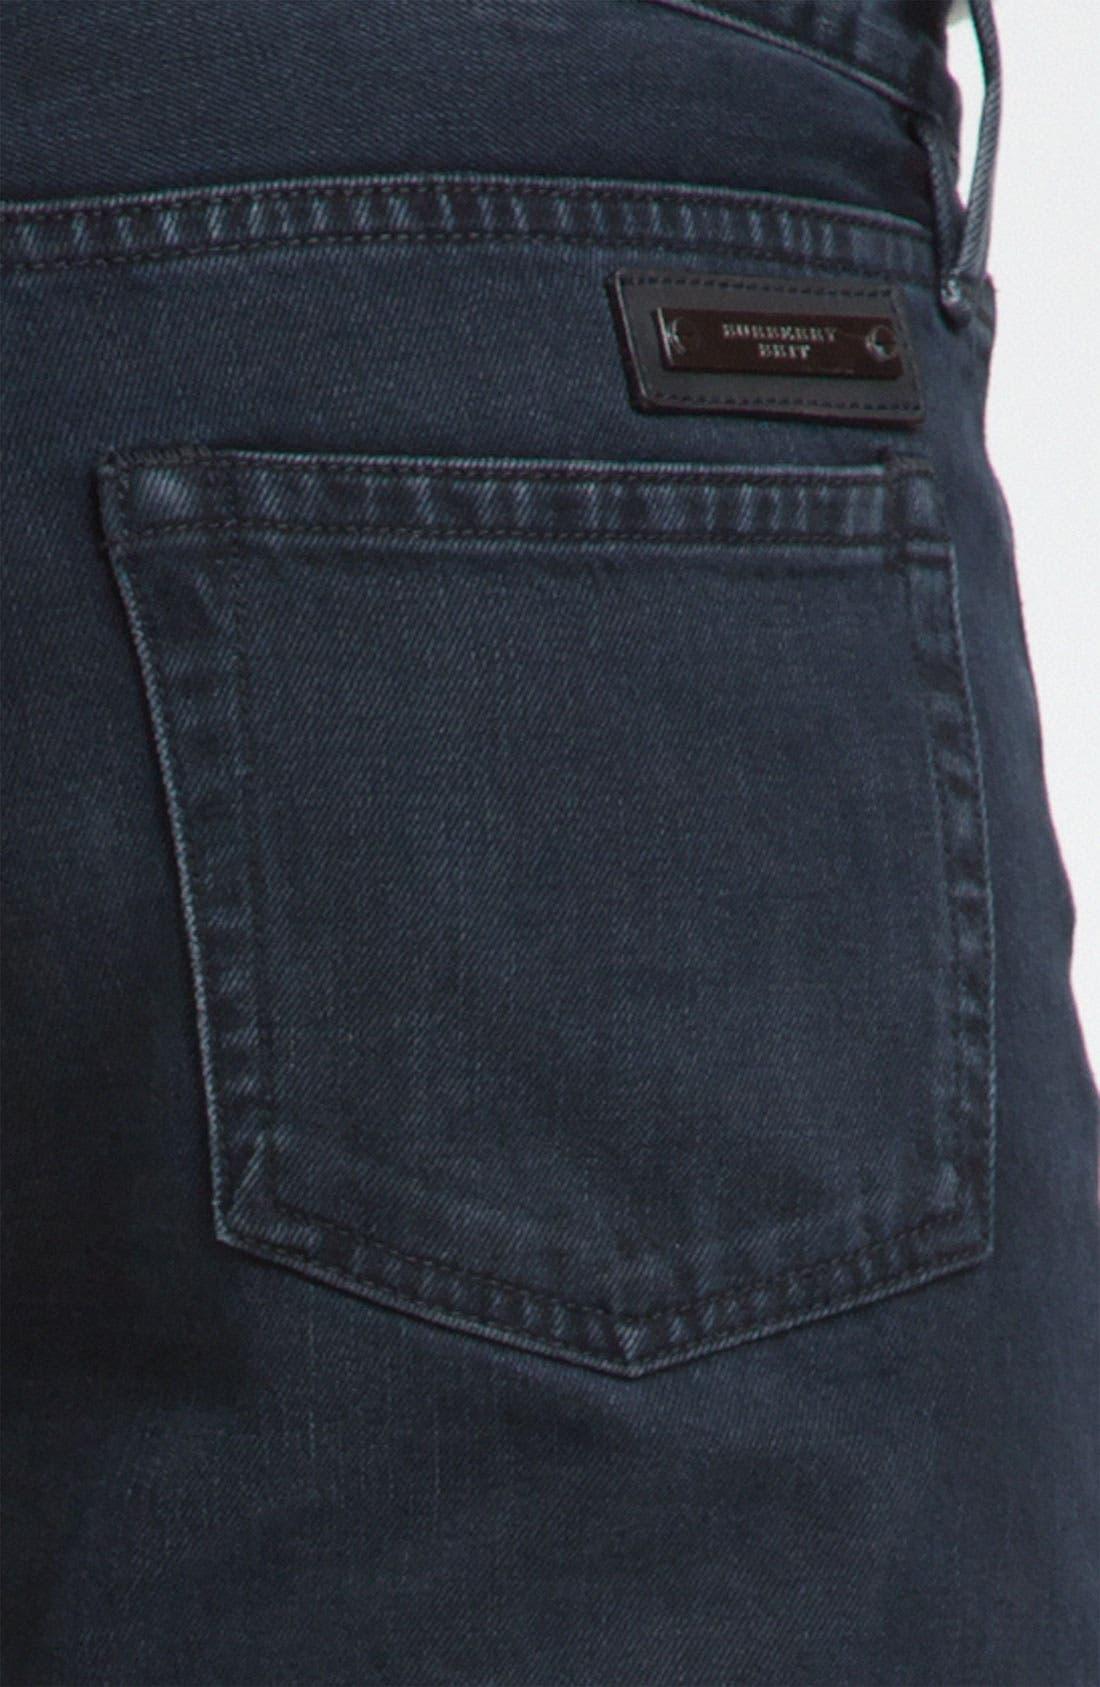 Alternate Image 3  - Burberry Brit Straight Leg Jeans (Supersoft Black)